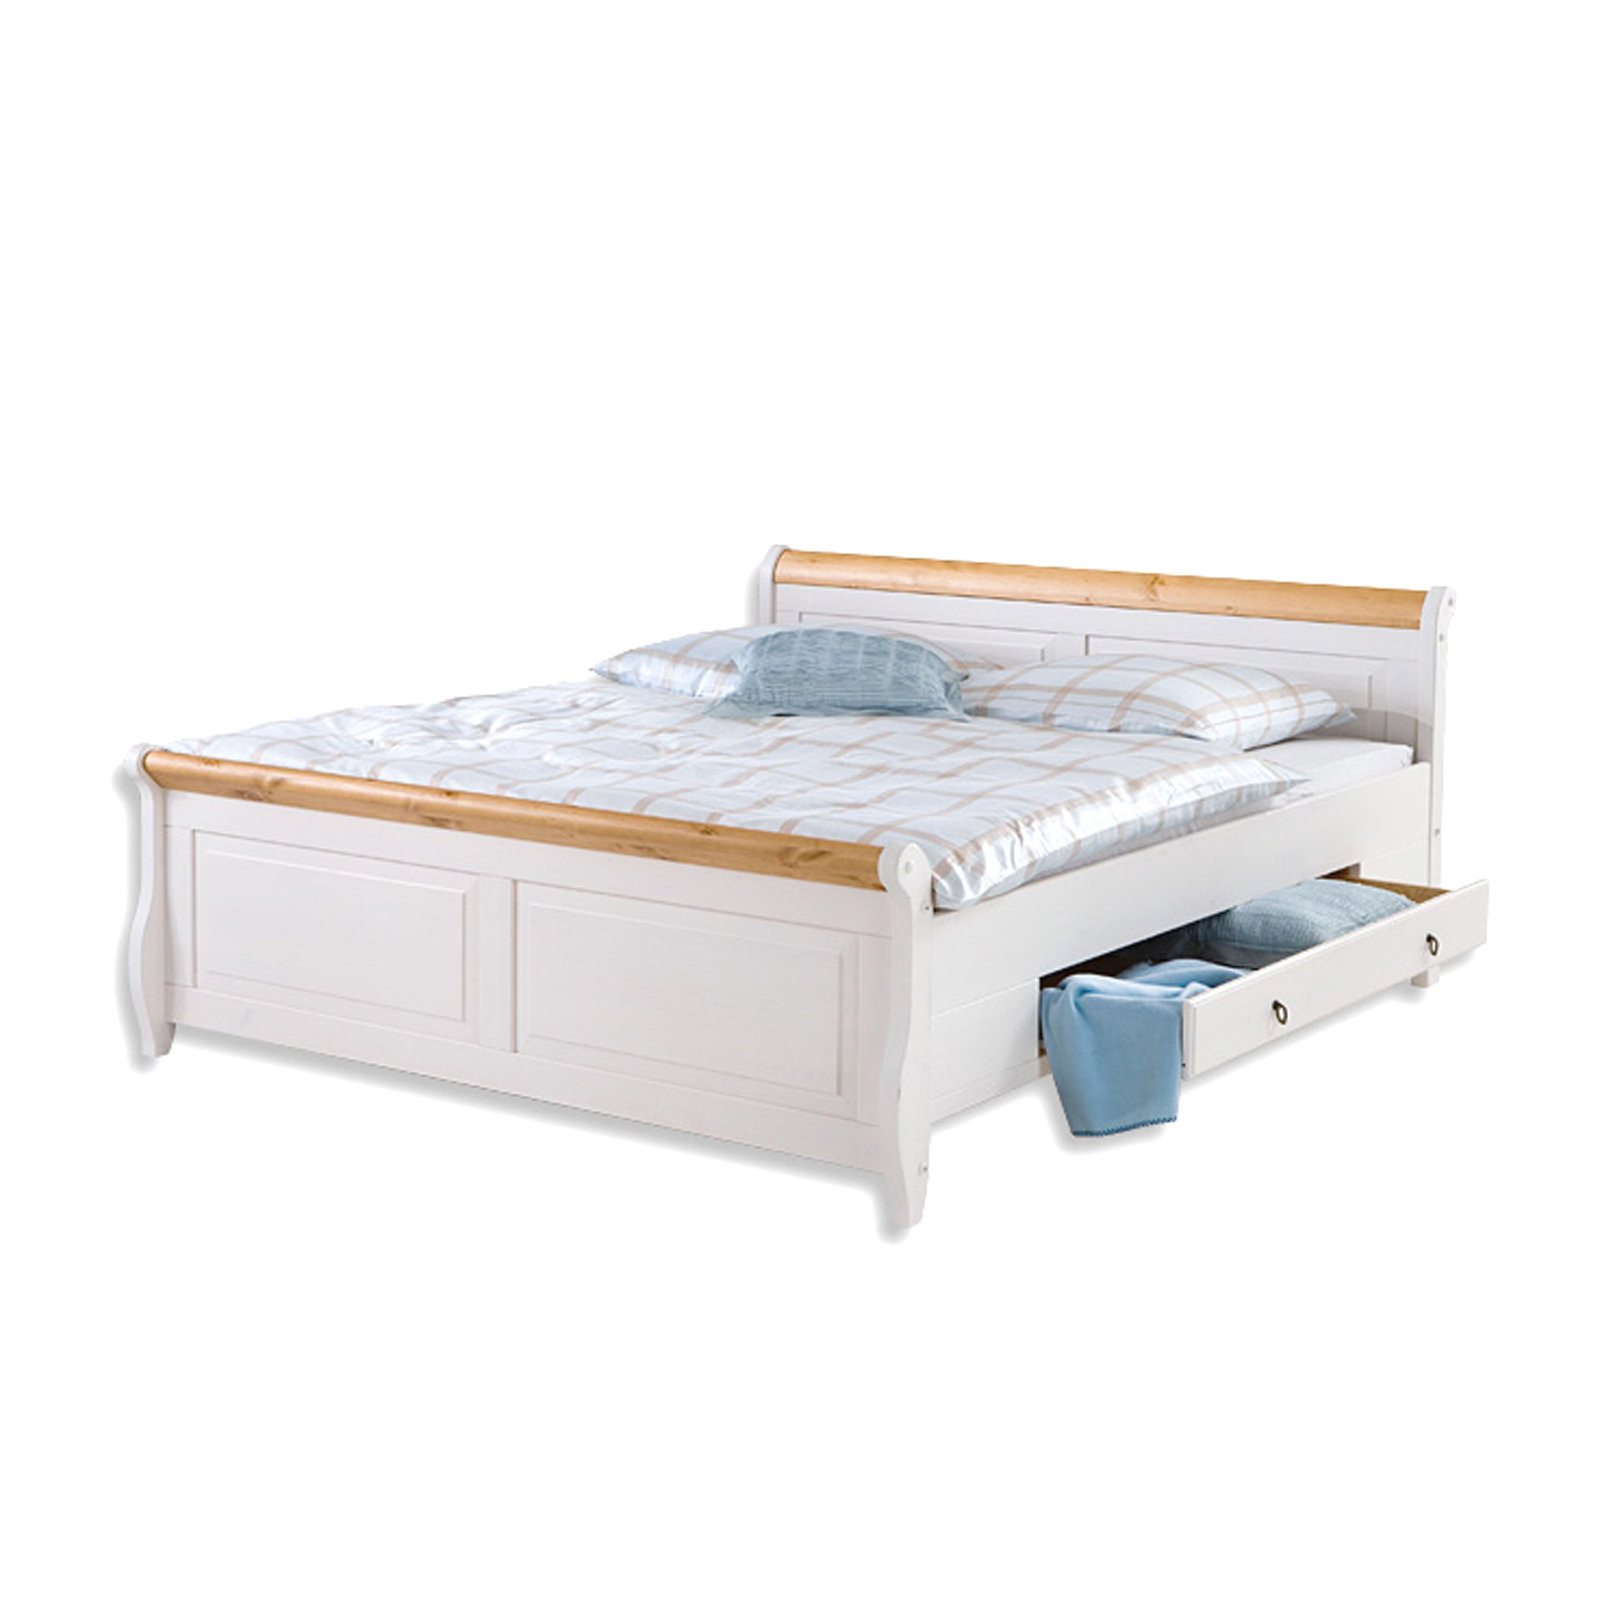 Full Size of 37 R1 Bett 100x200 Roller Fhrung Betten Weiß Wohnzimmer Metallbett 100x200